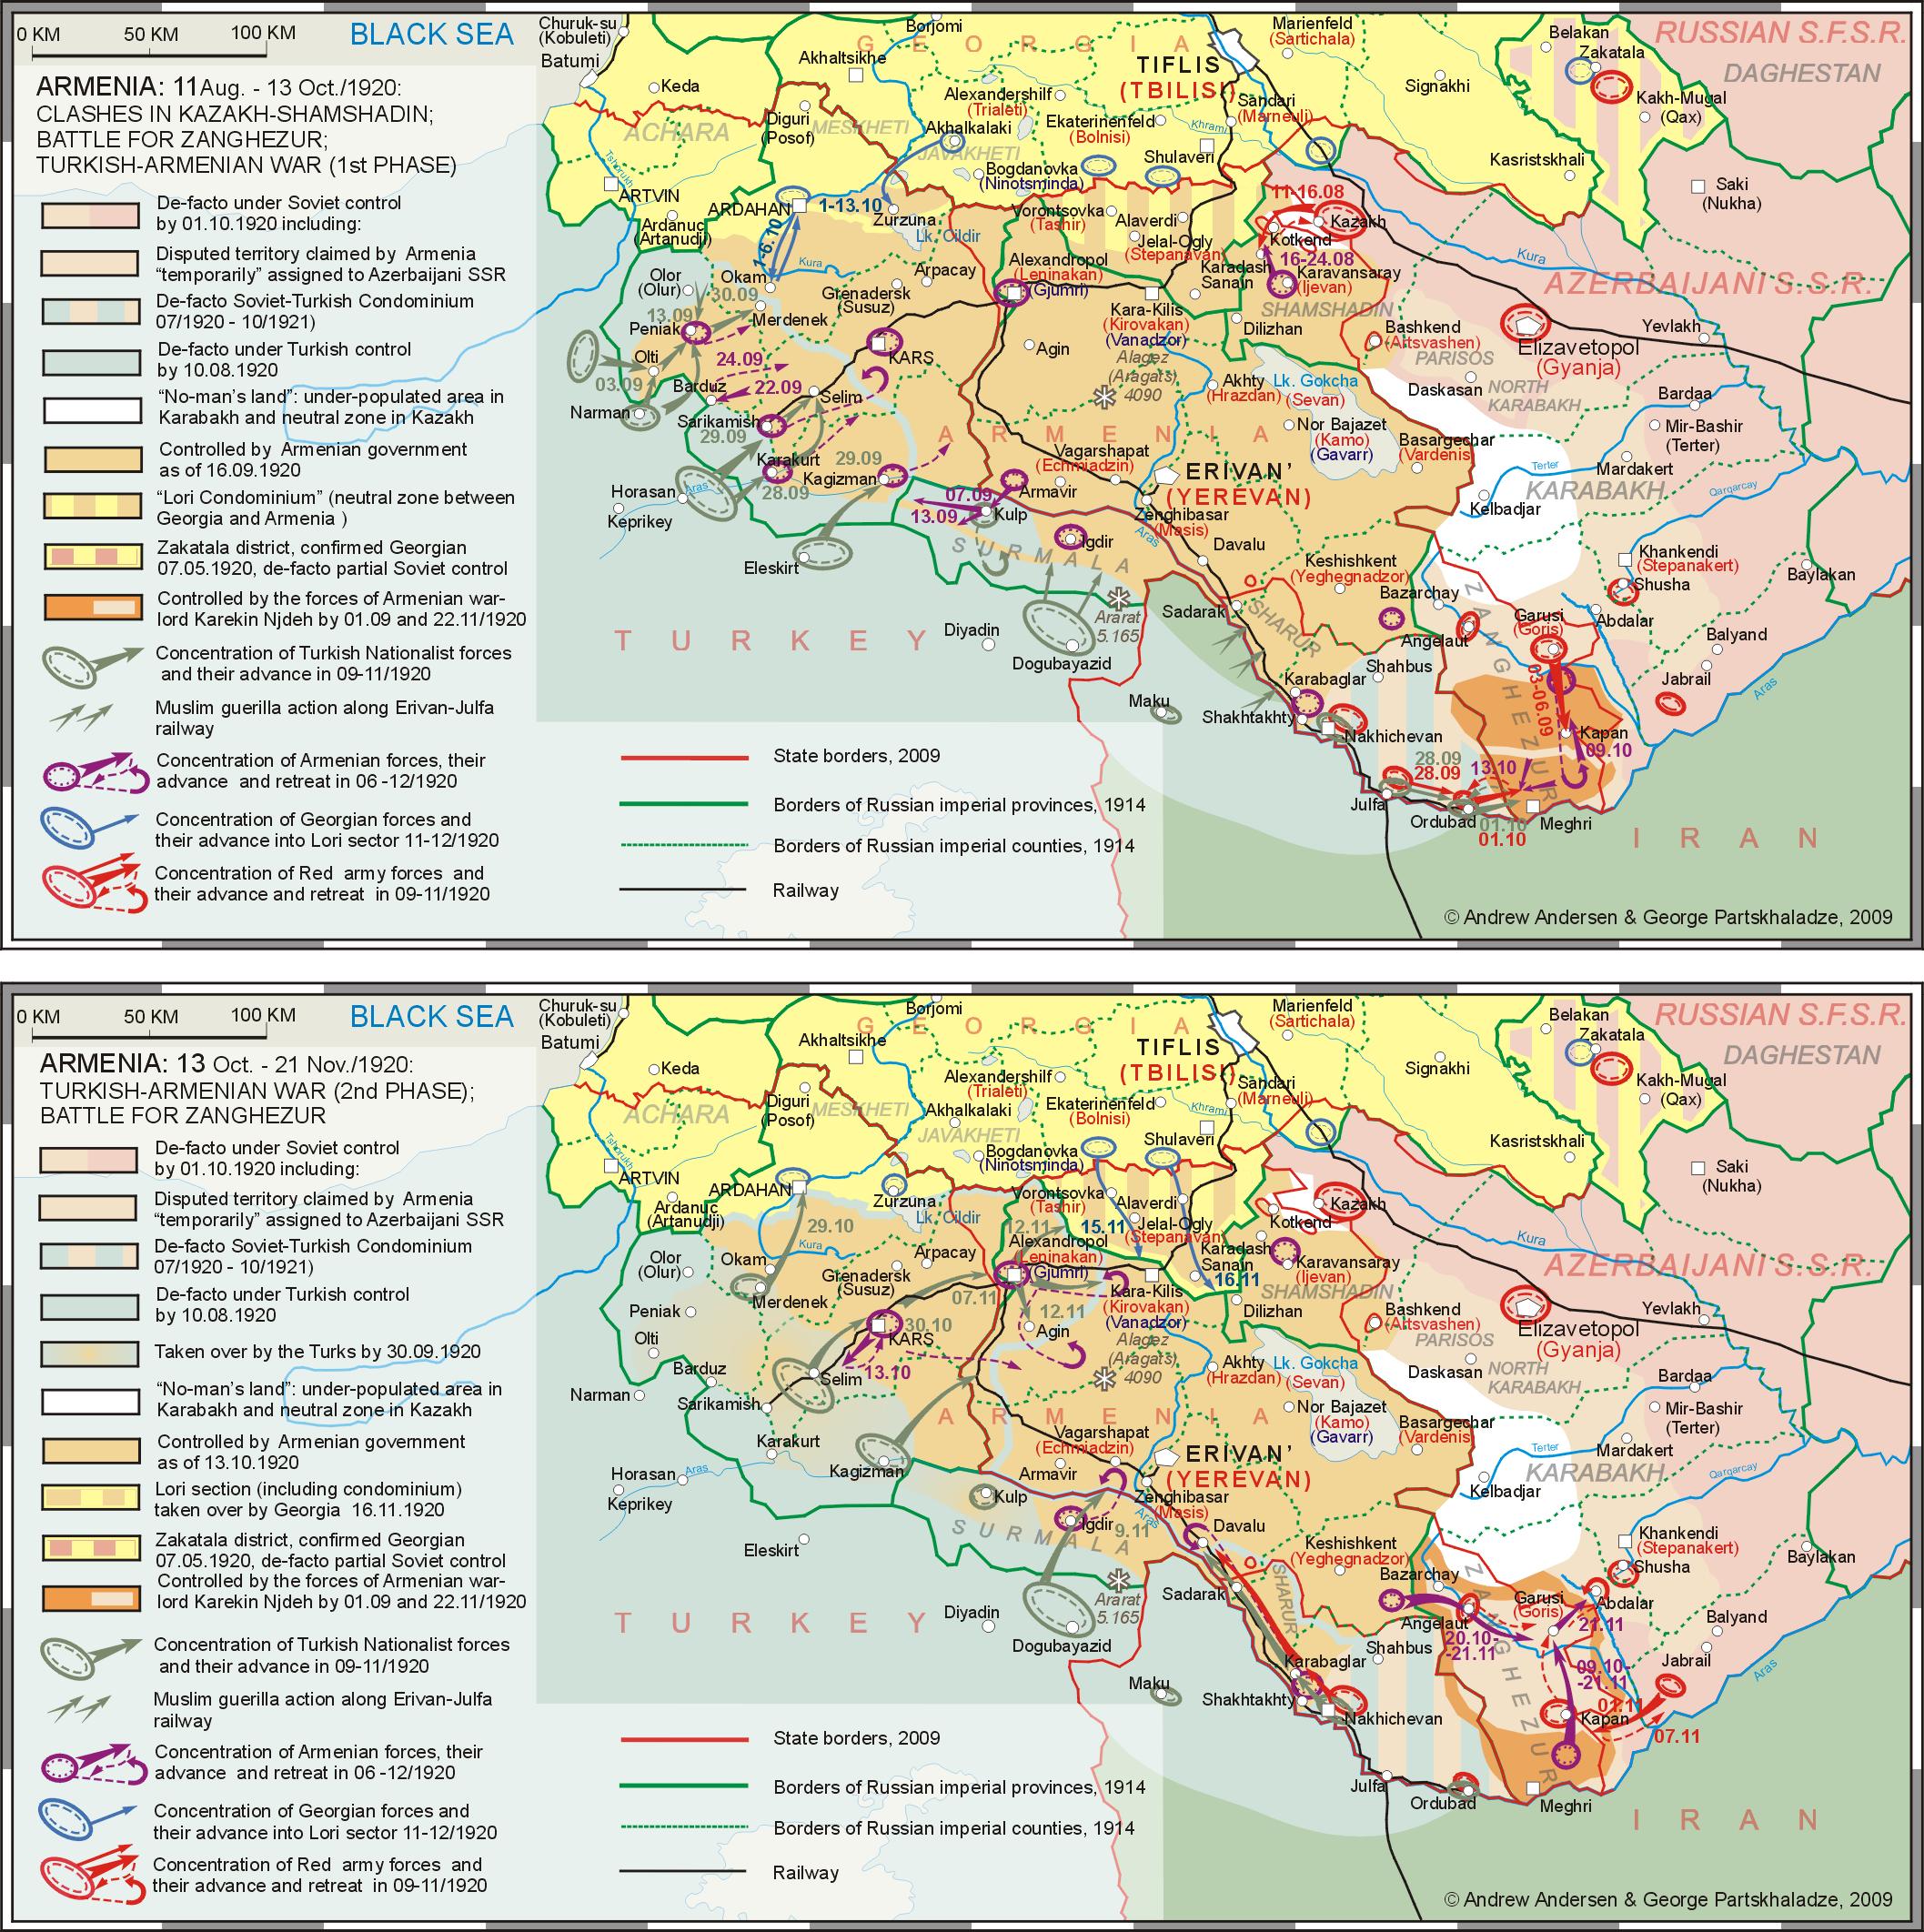 Iveria - Georgia map 1921